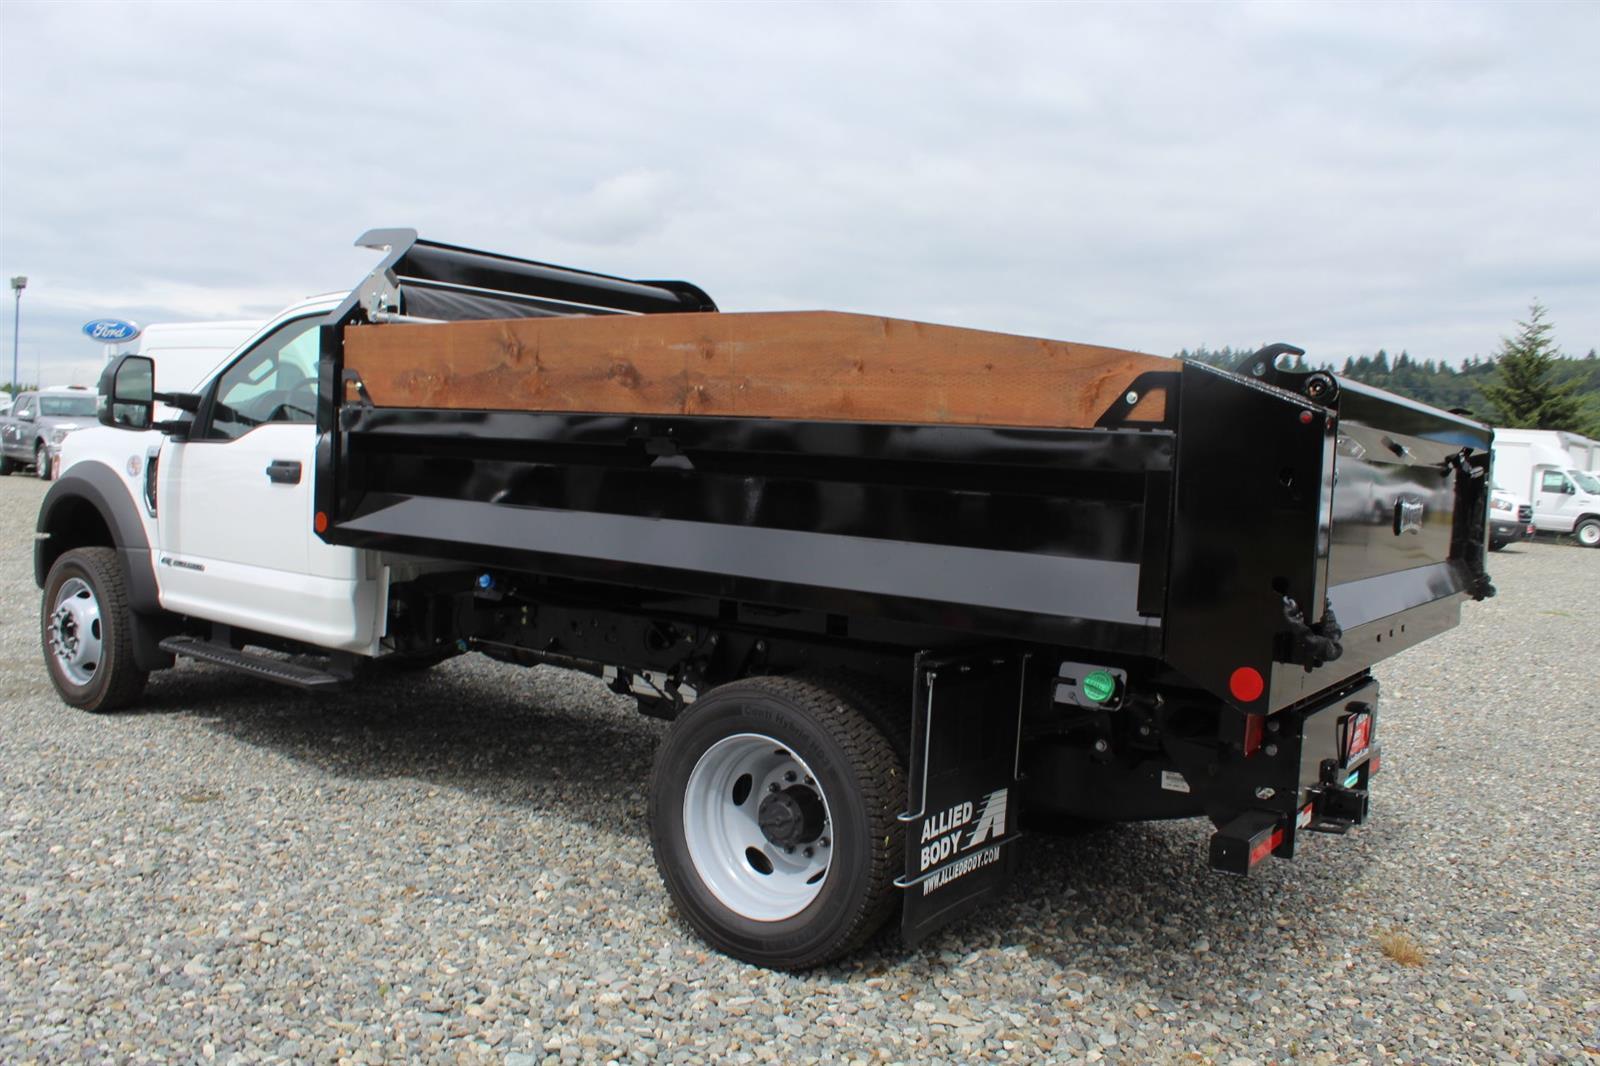 2020 Ford F-550 Regular Cab DRW 4x4, Knapheide Rigid Side Dump Body #E9514 - photo 2